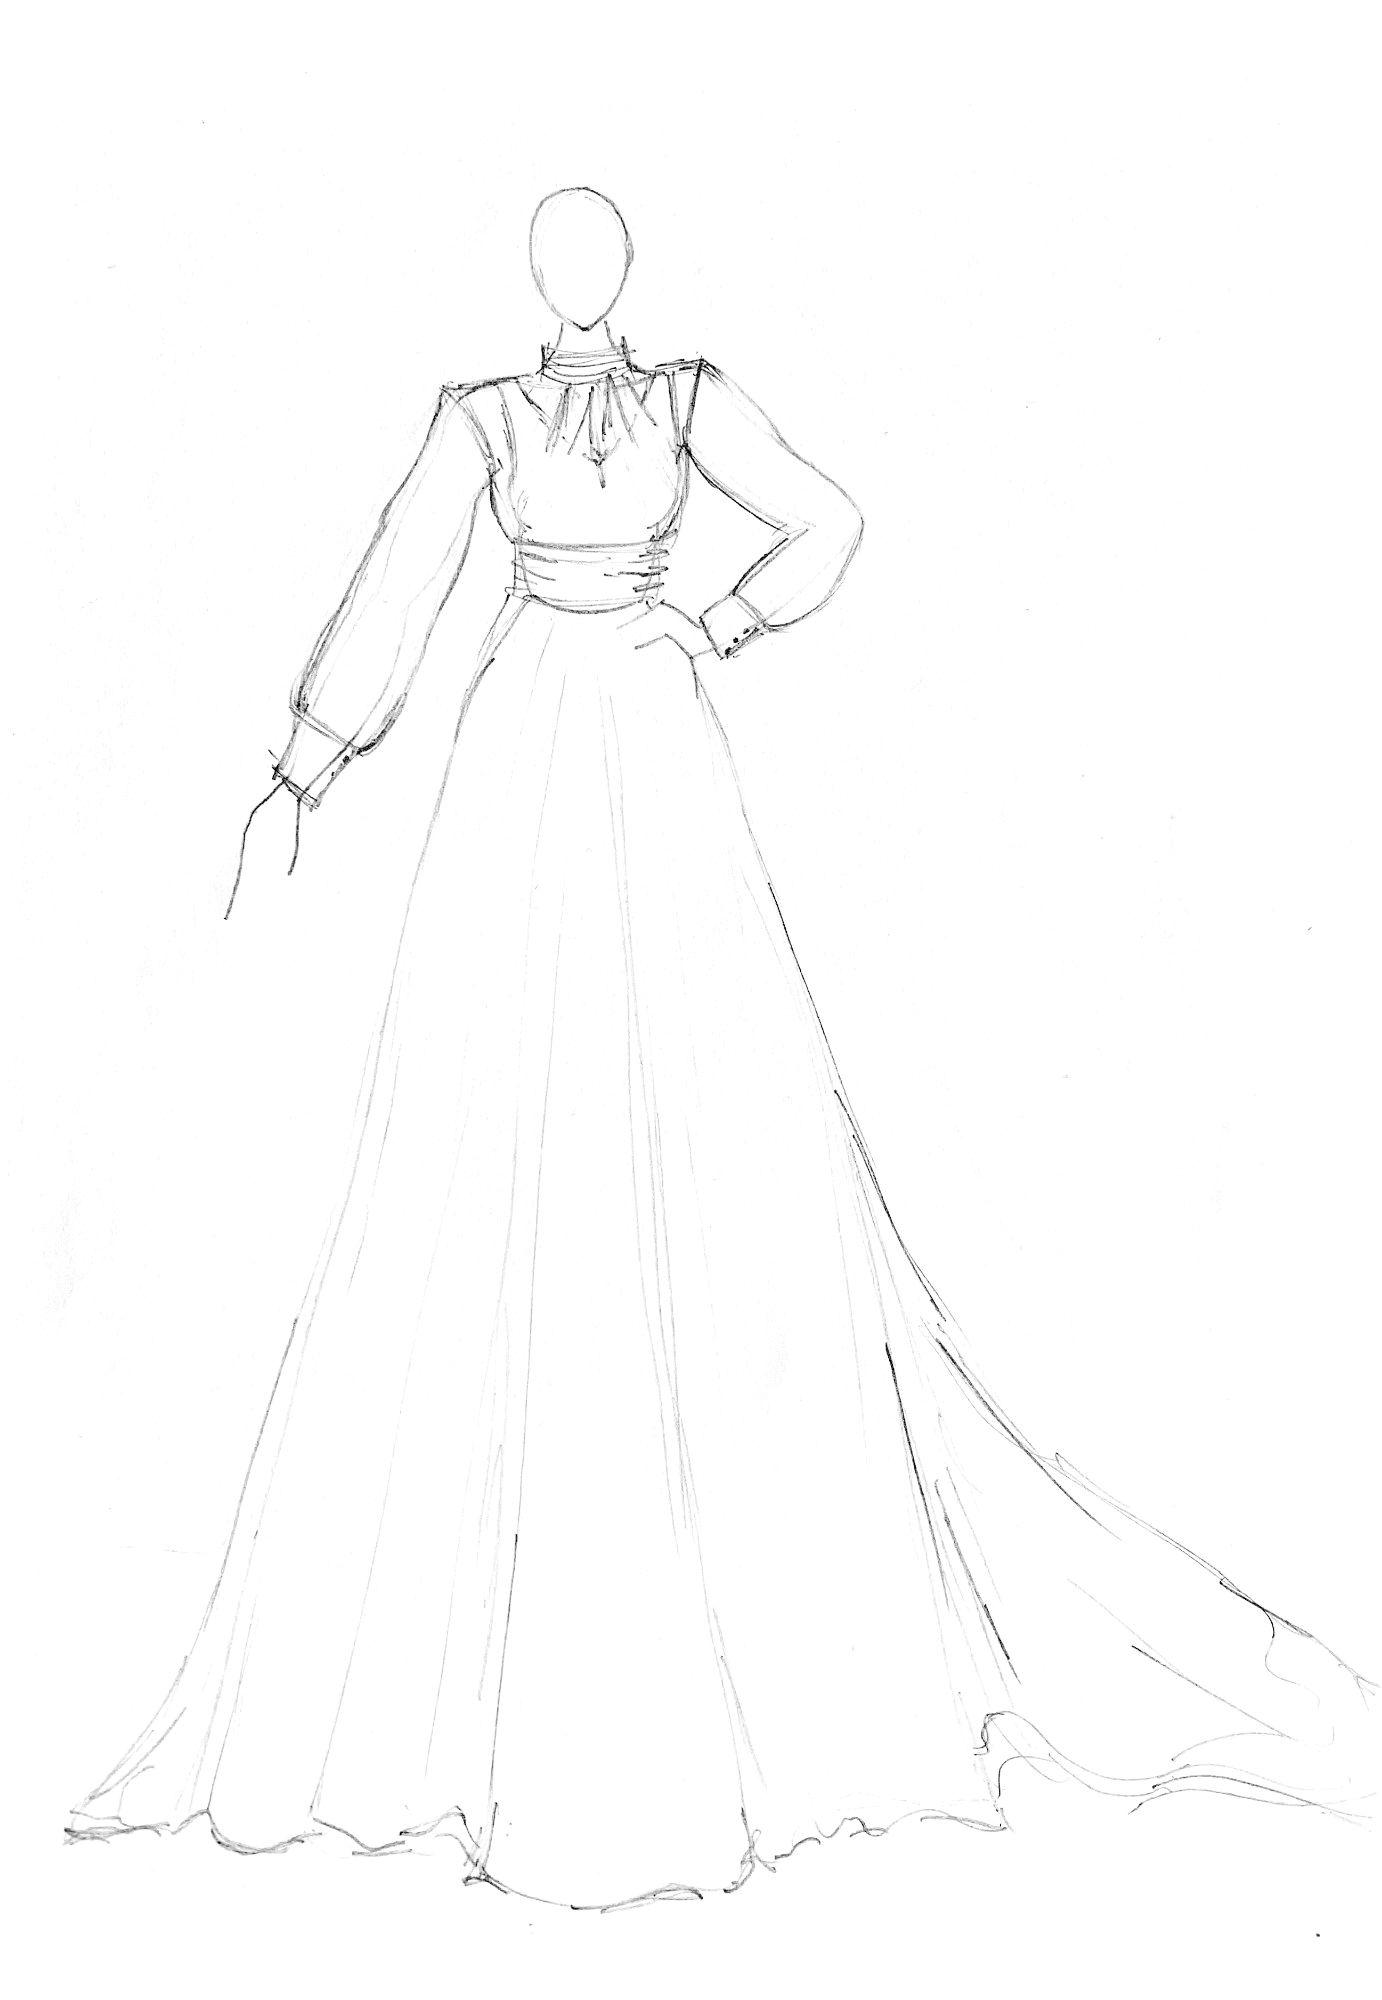 bespoke wedding dress sketch